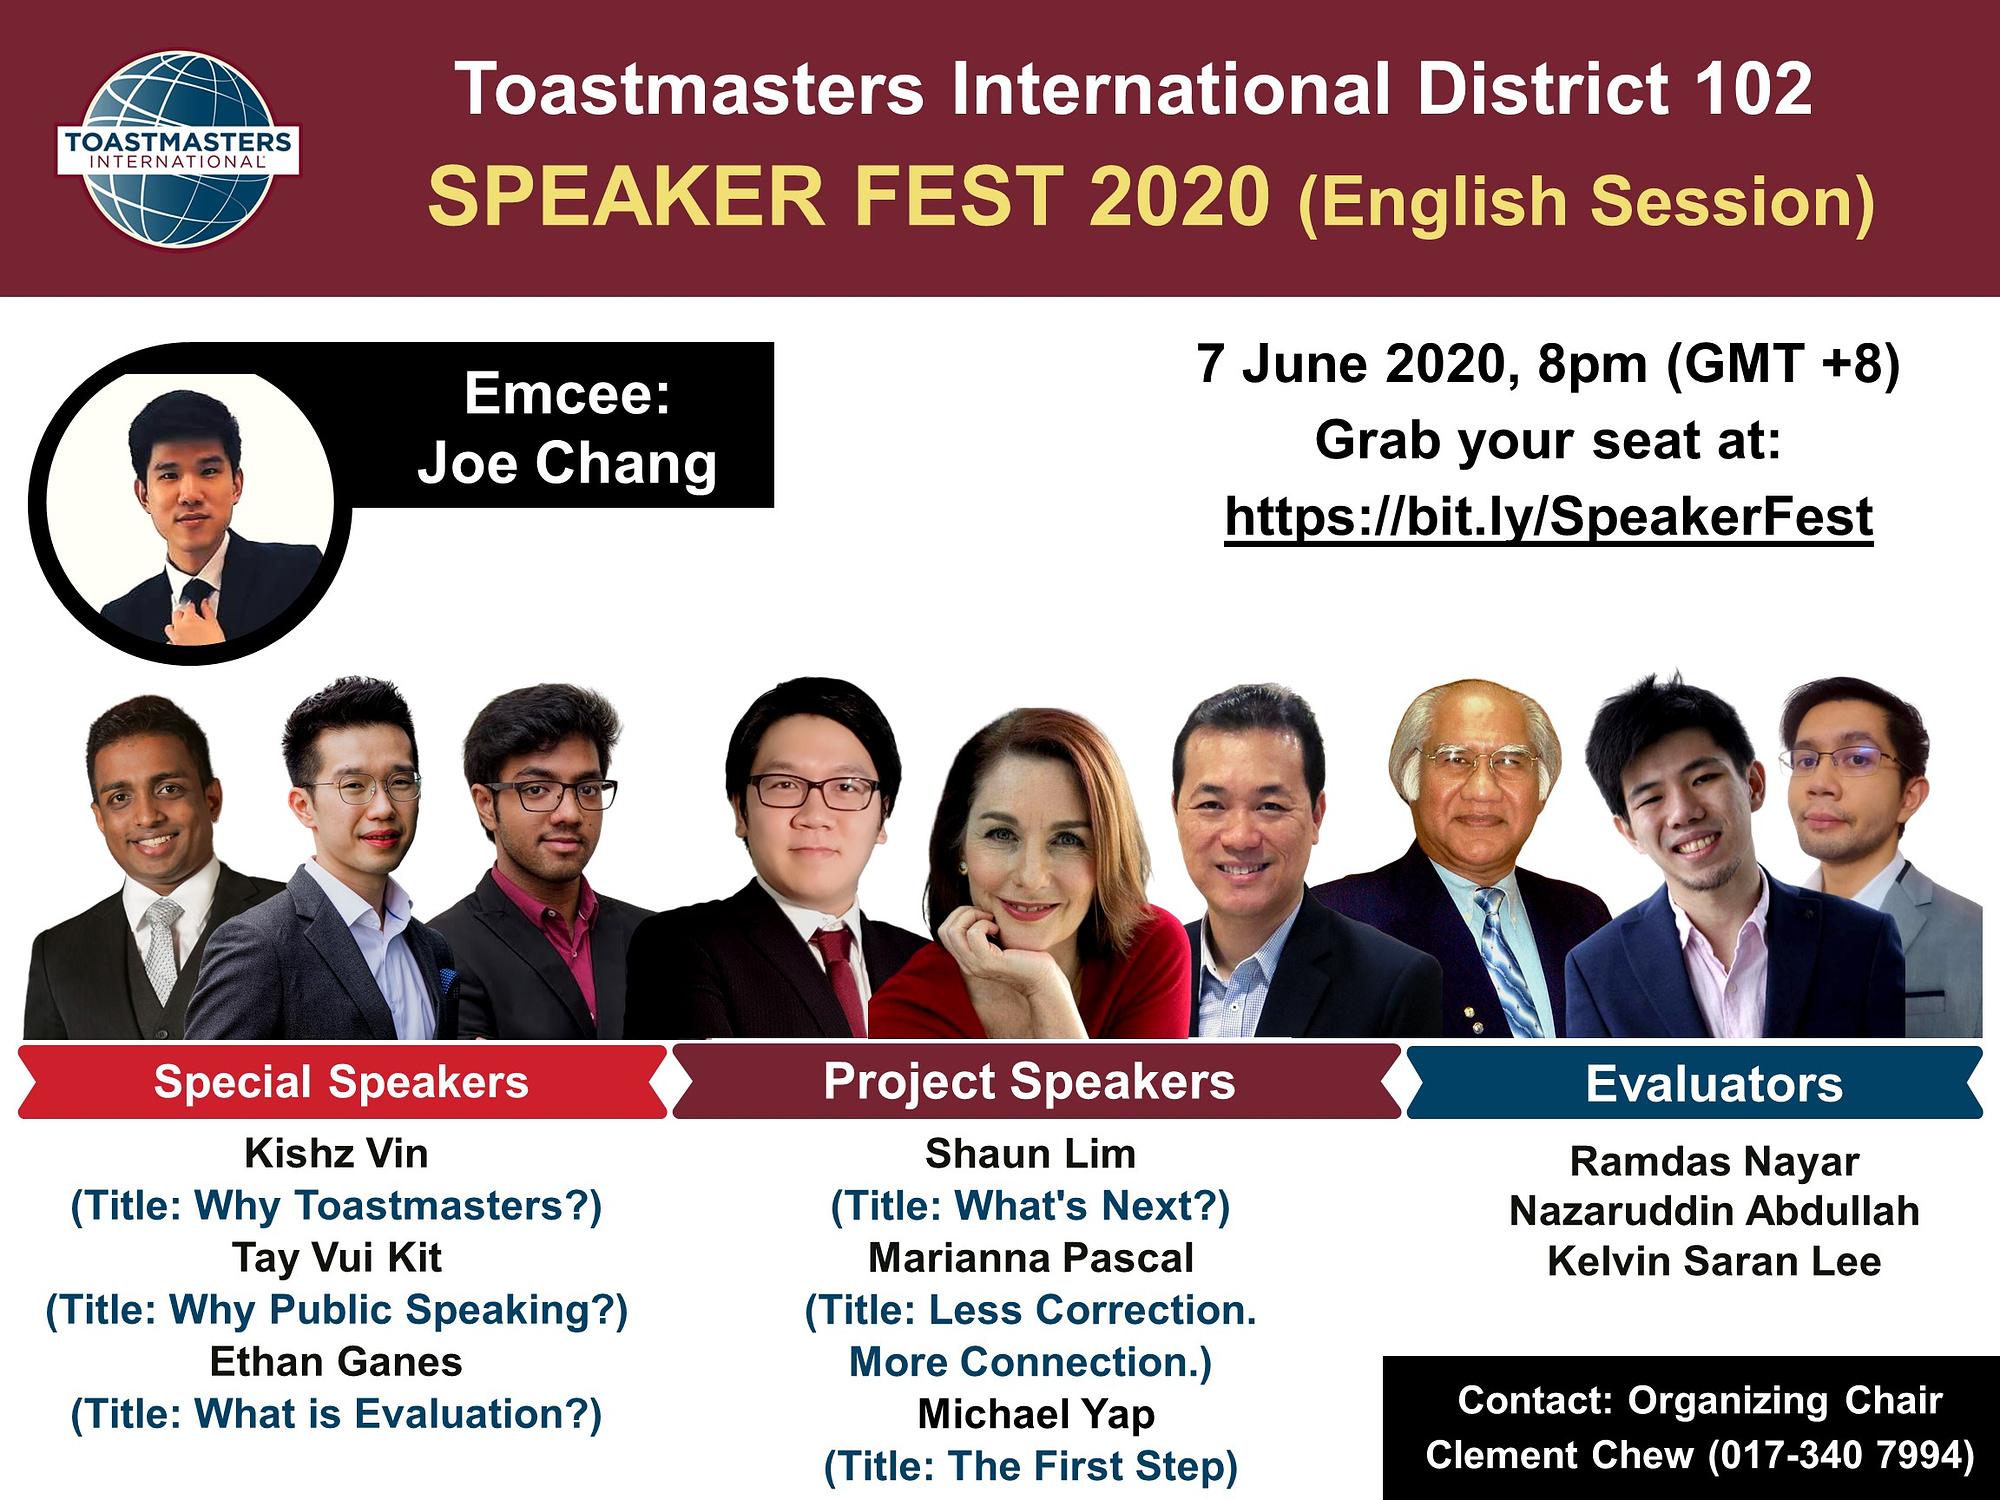 speaker fest district 102